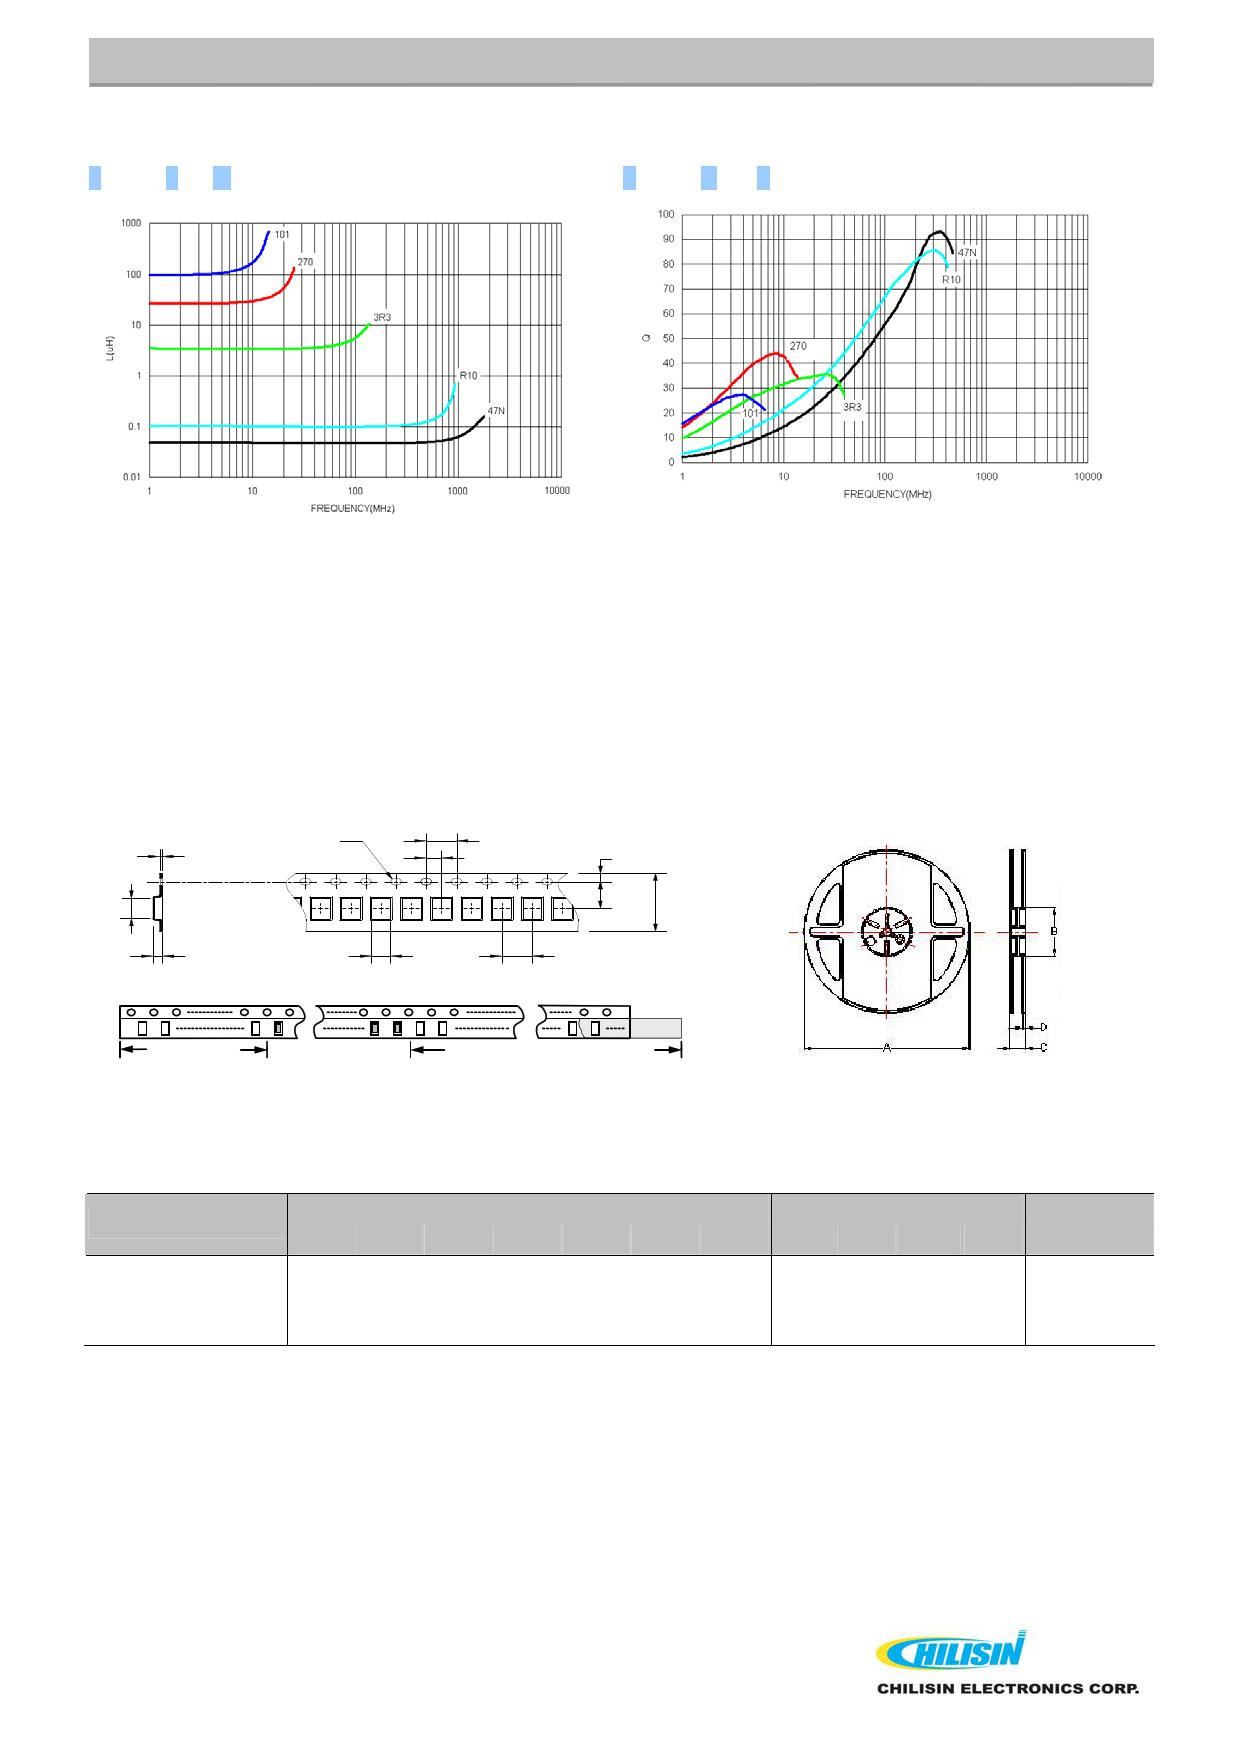 NL201614T pdf, 반도체, 판매, 대치품